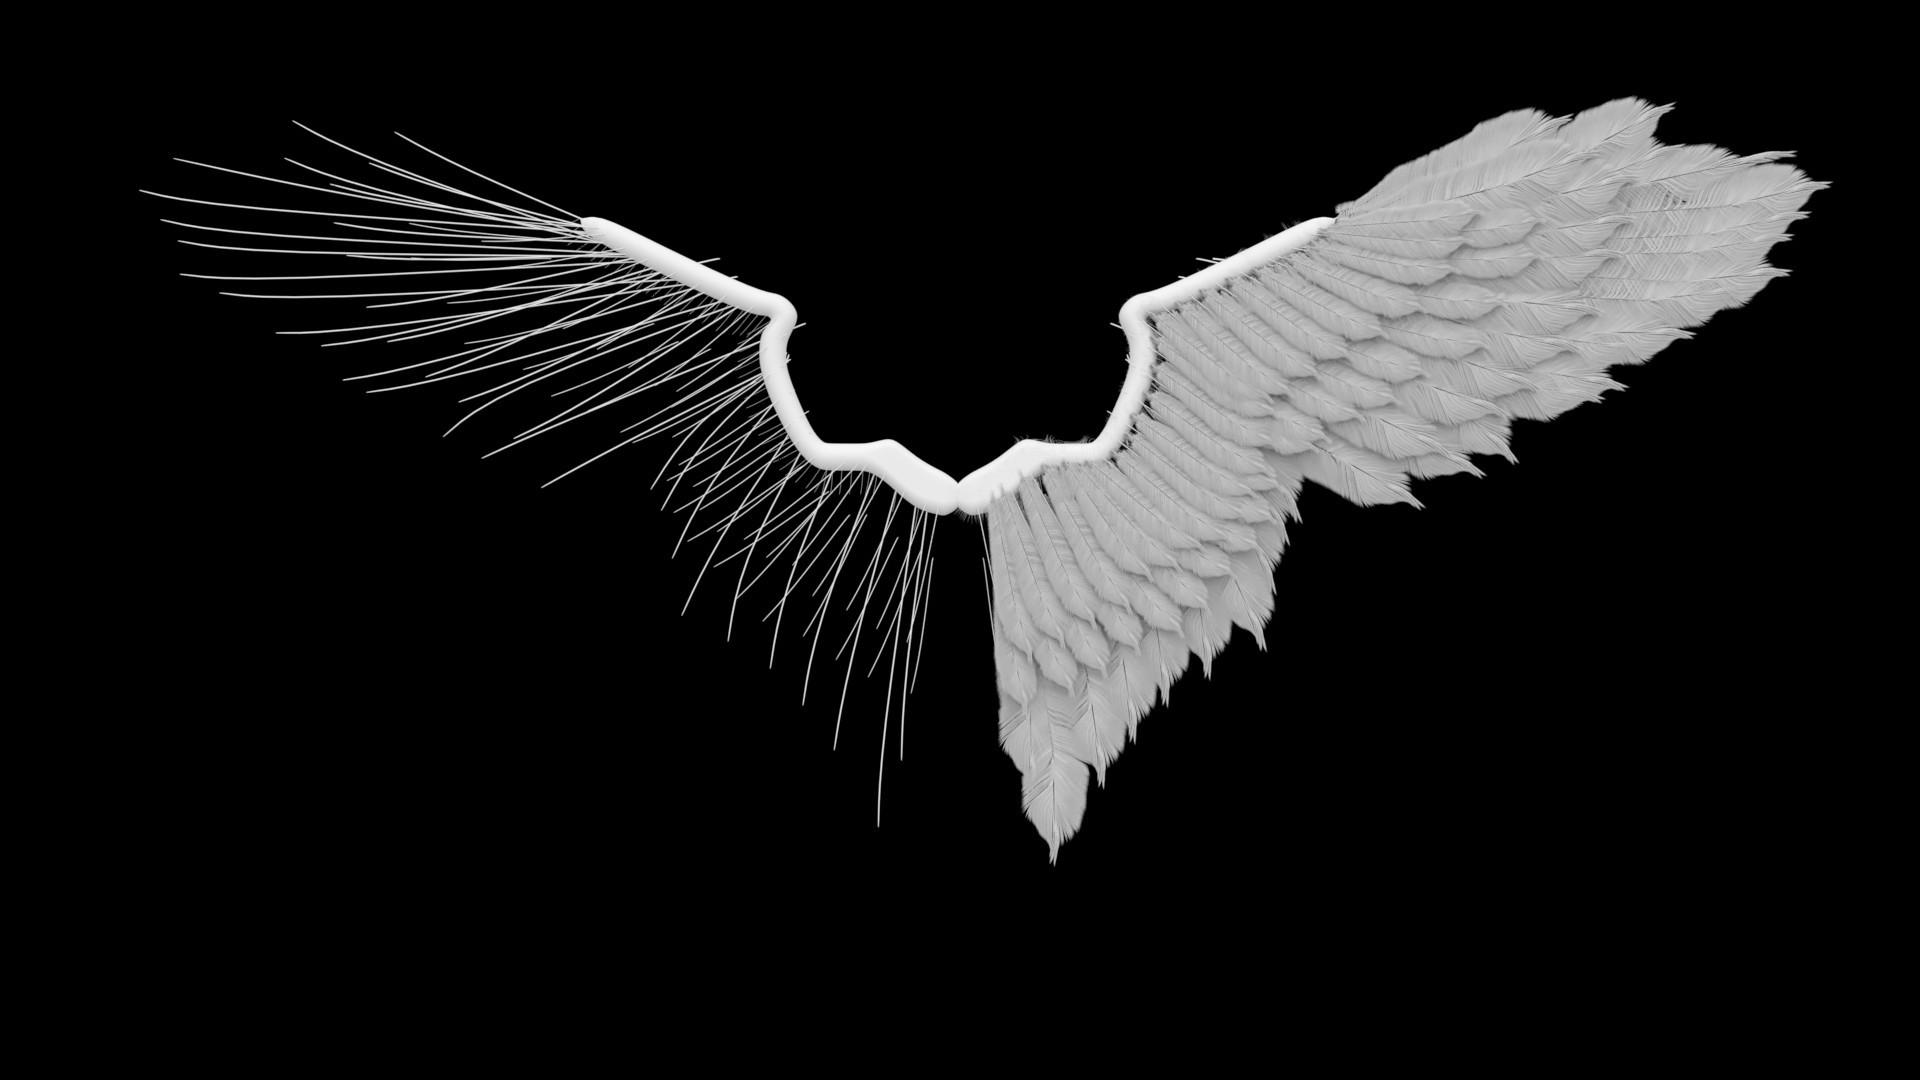 фон с крыльями картинки платяным шкафом